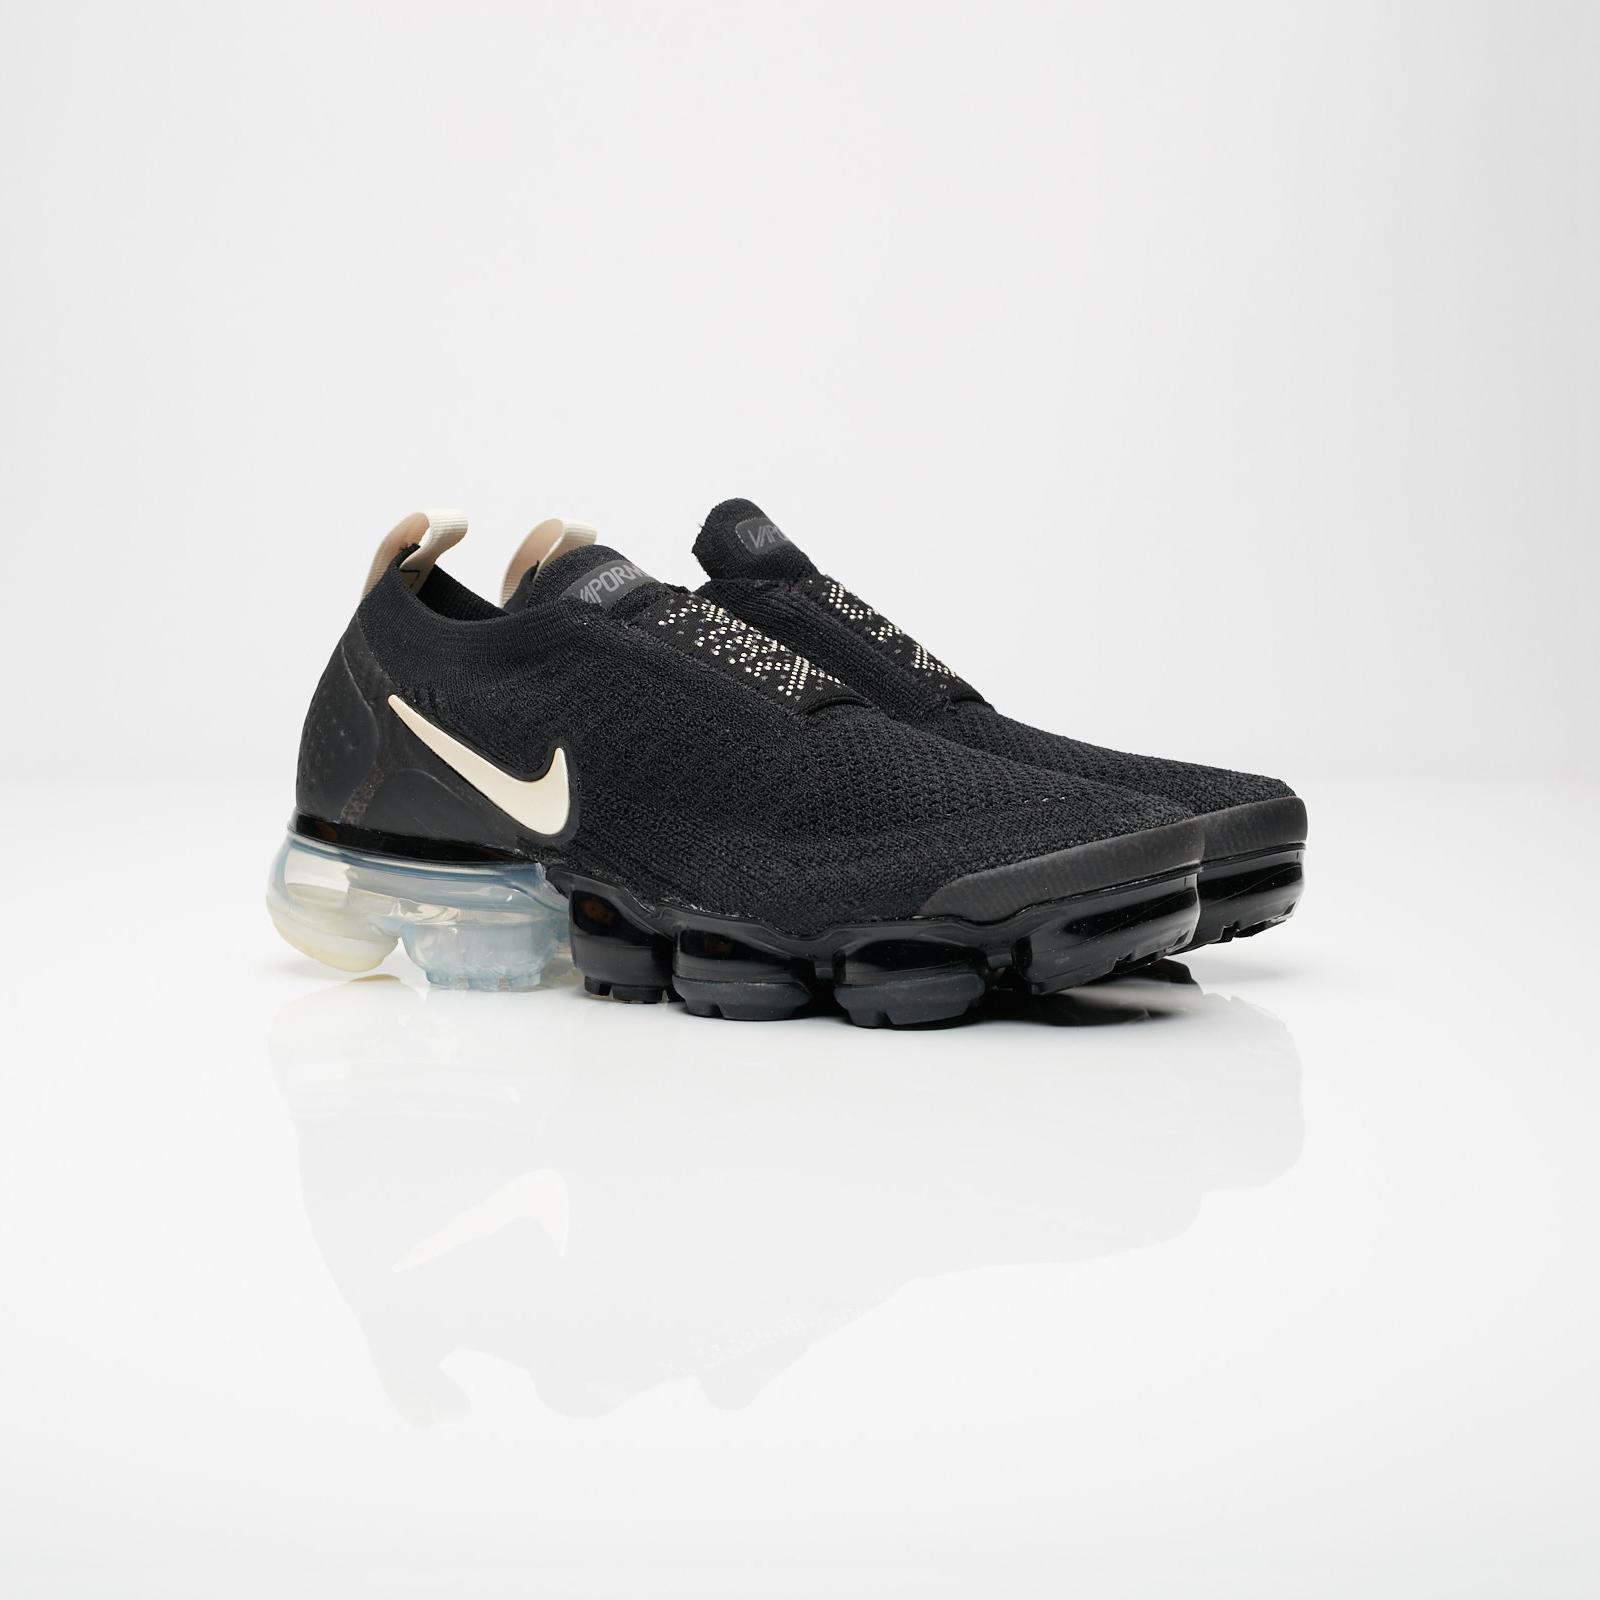 Nike Wmns Air Vapormax Fk Moc 2